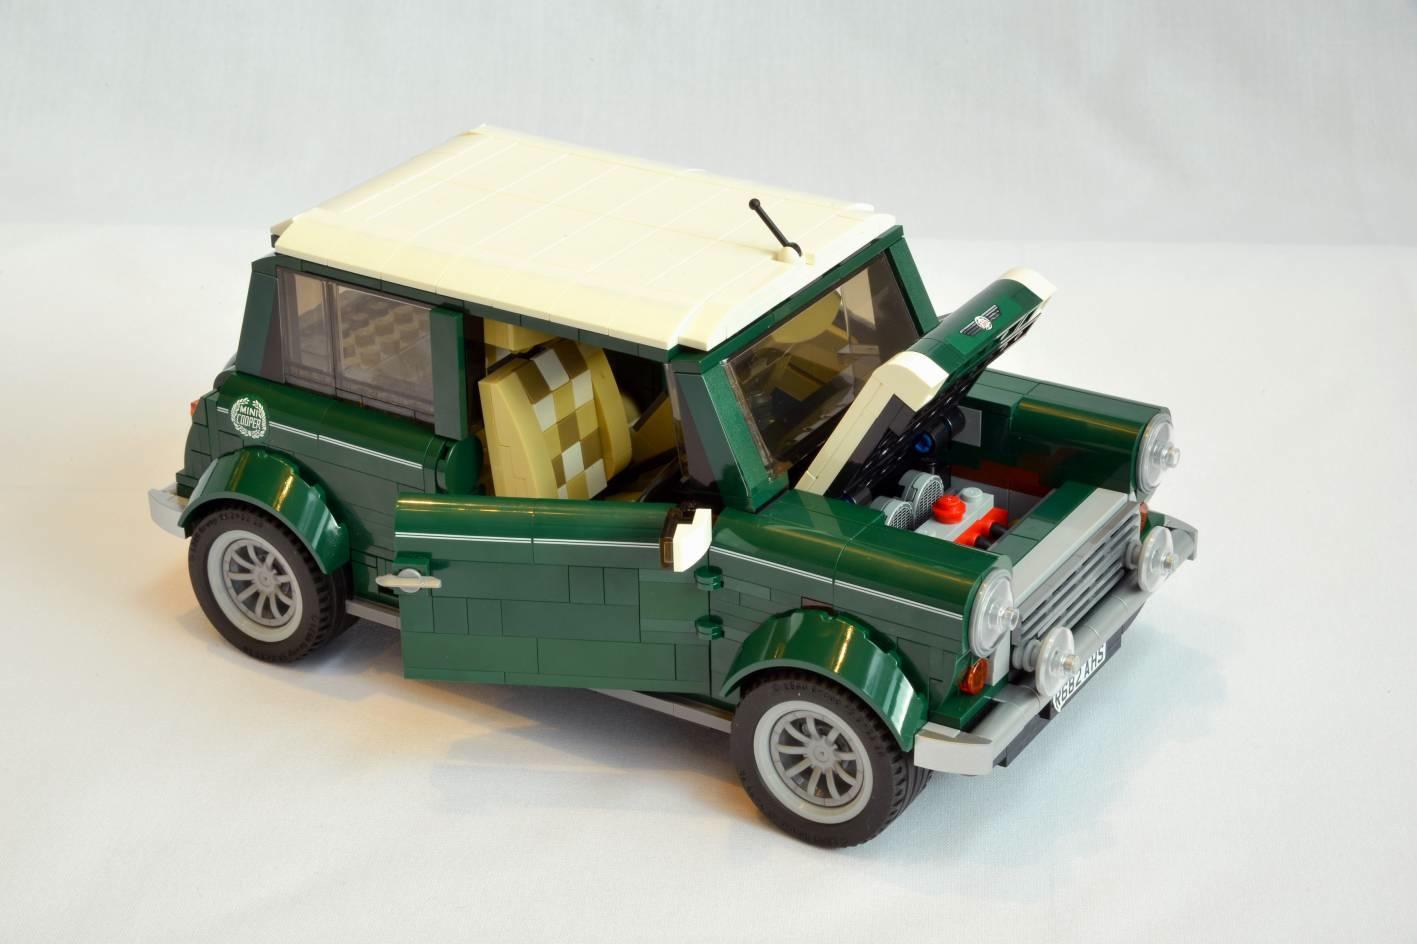 Lego Adds Mini Cooper To Creator Expert Series